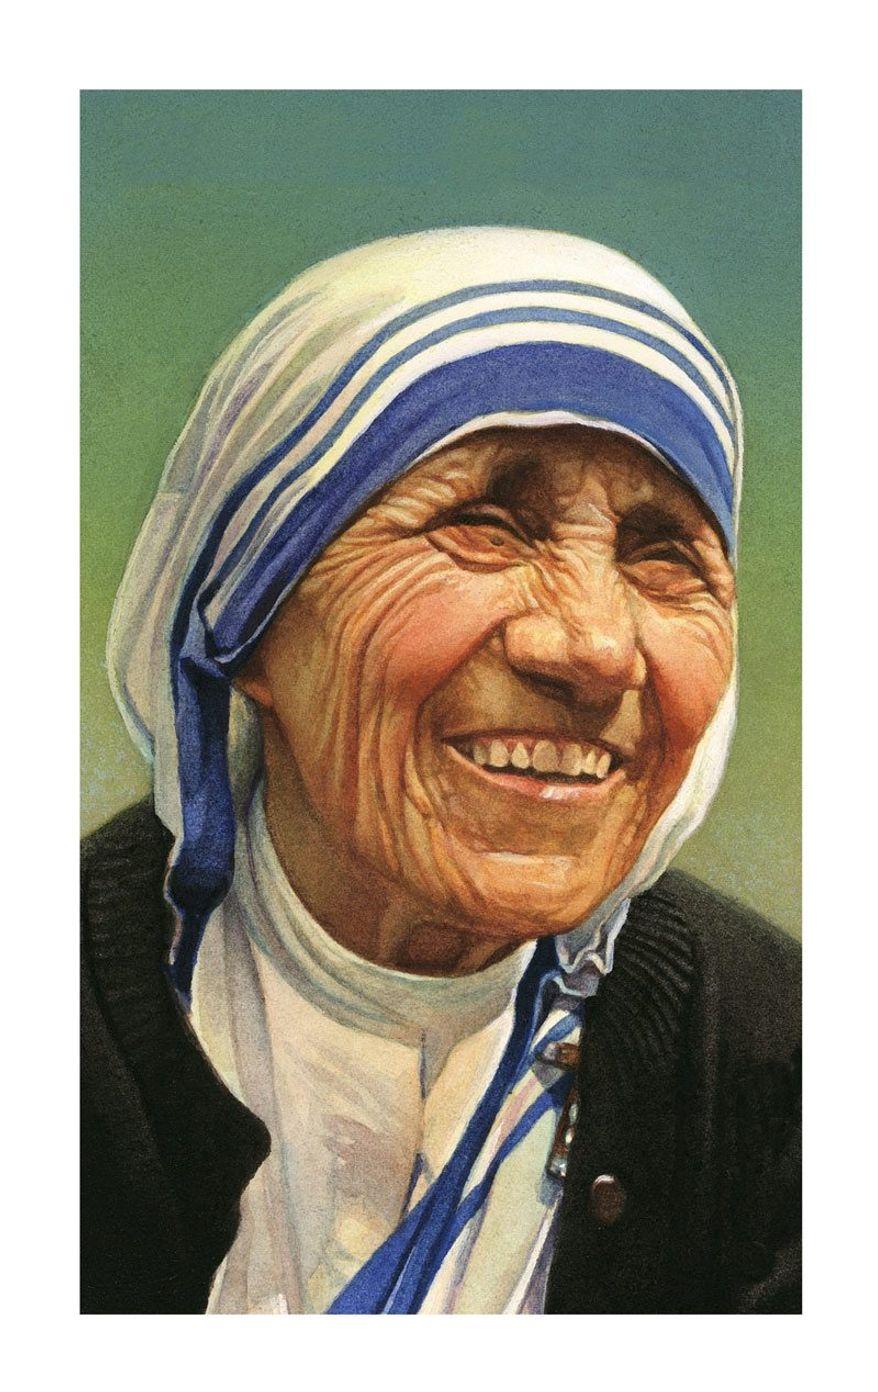 Mother Teresa         U.S. Postal Service